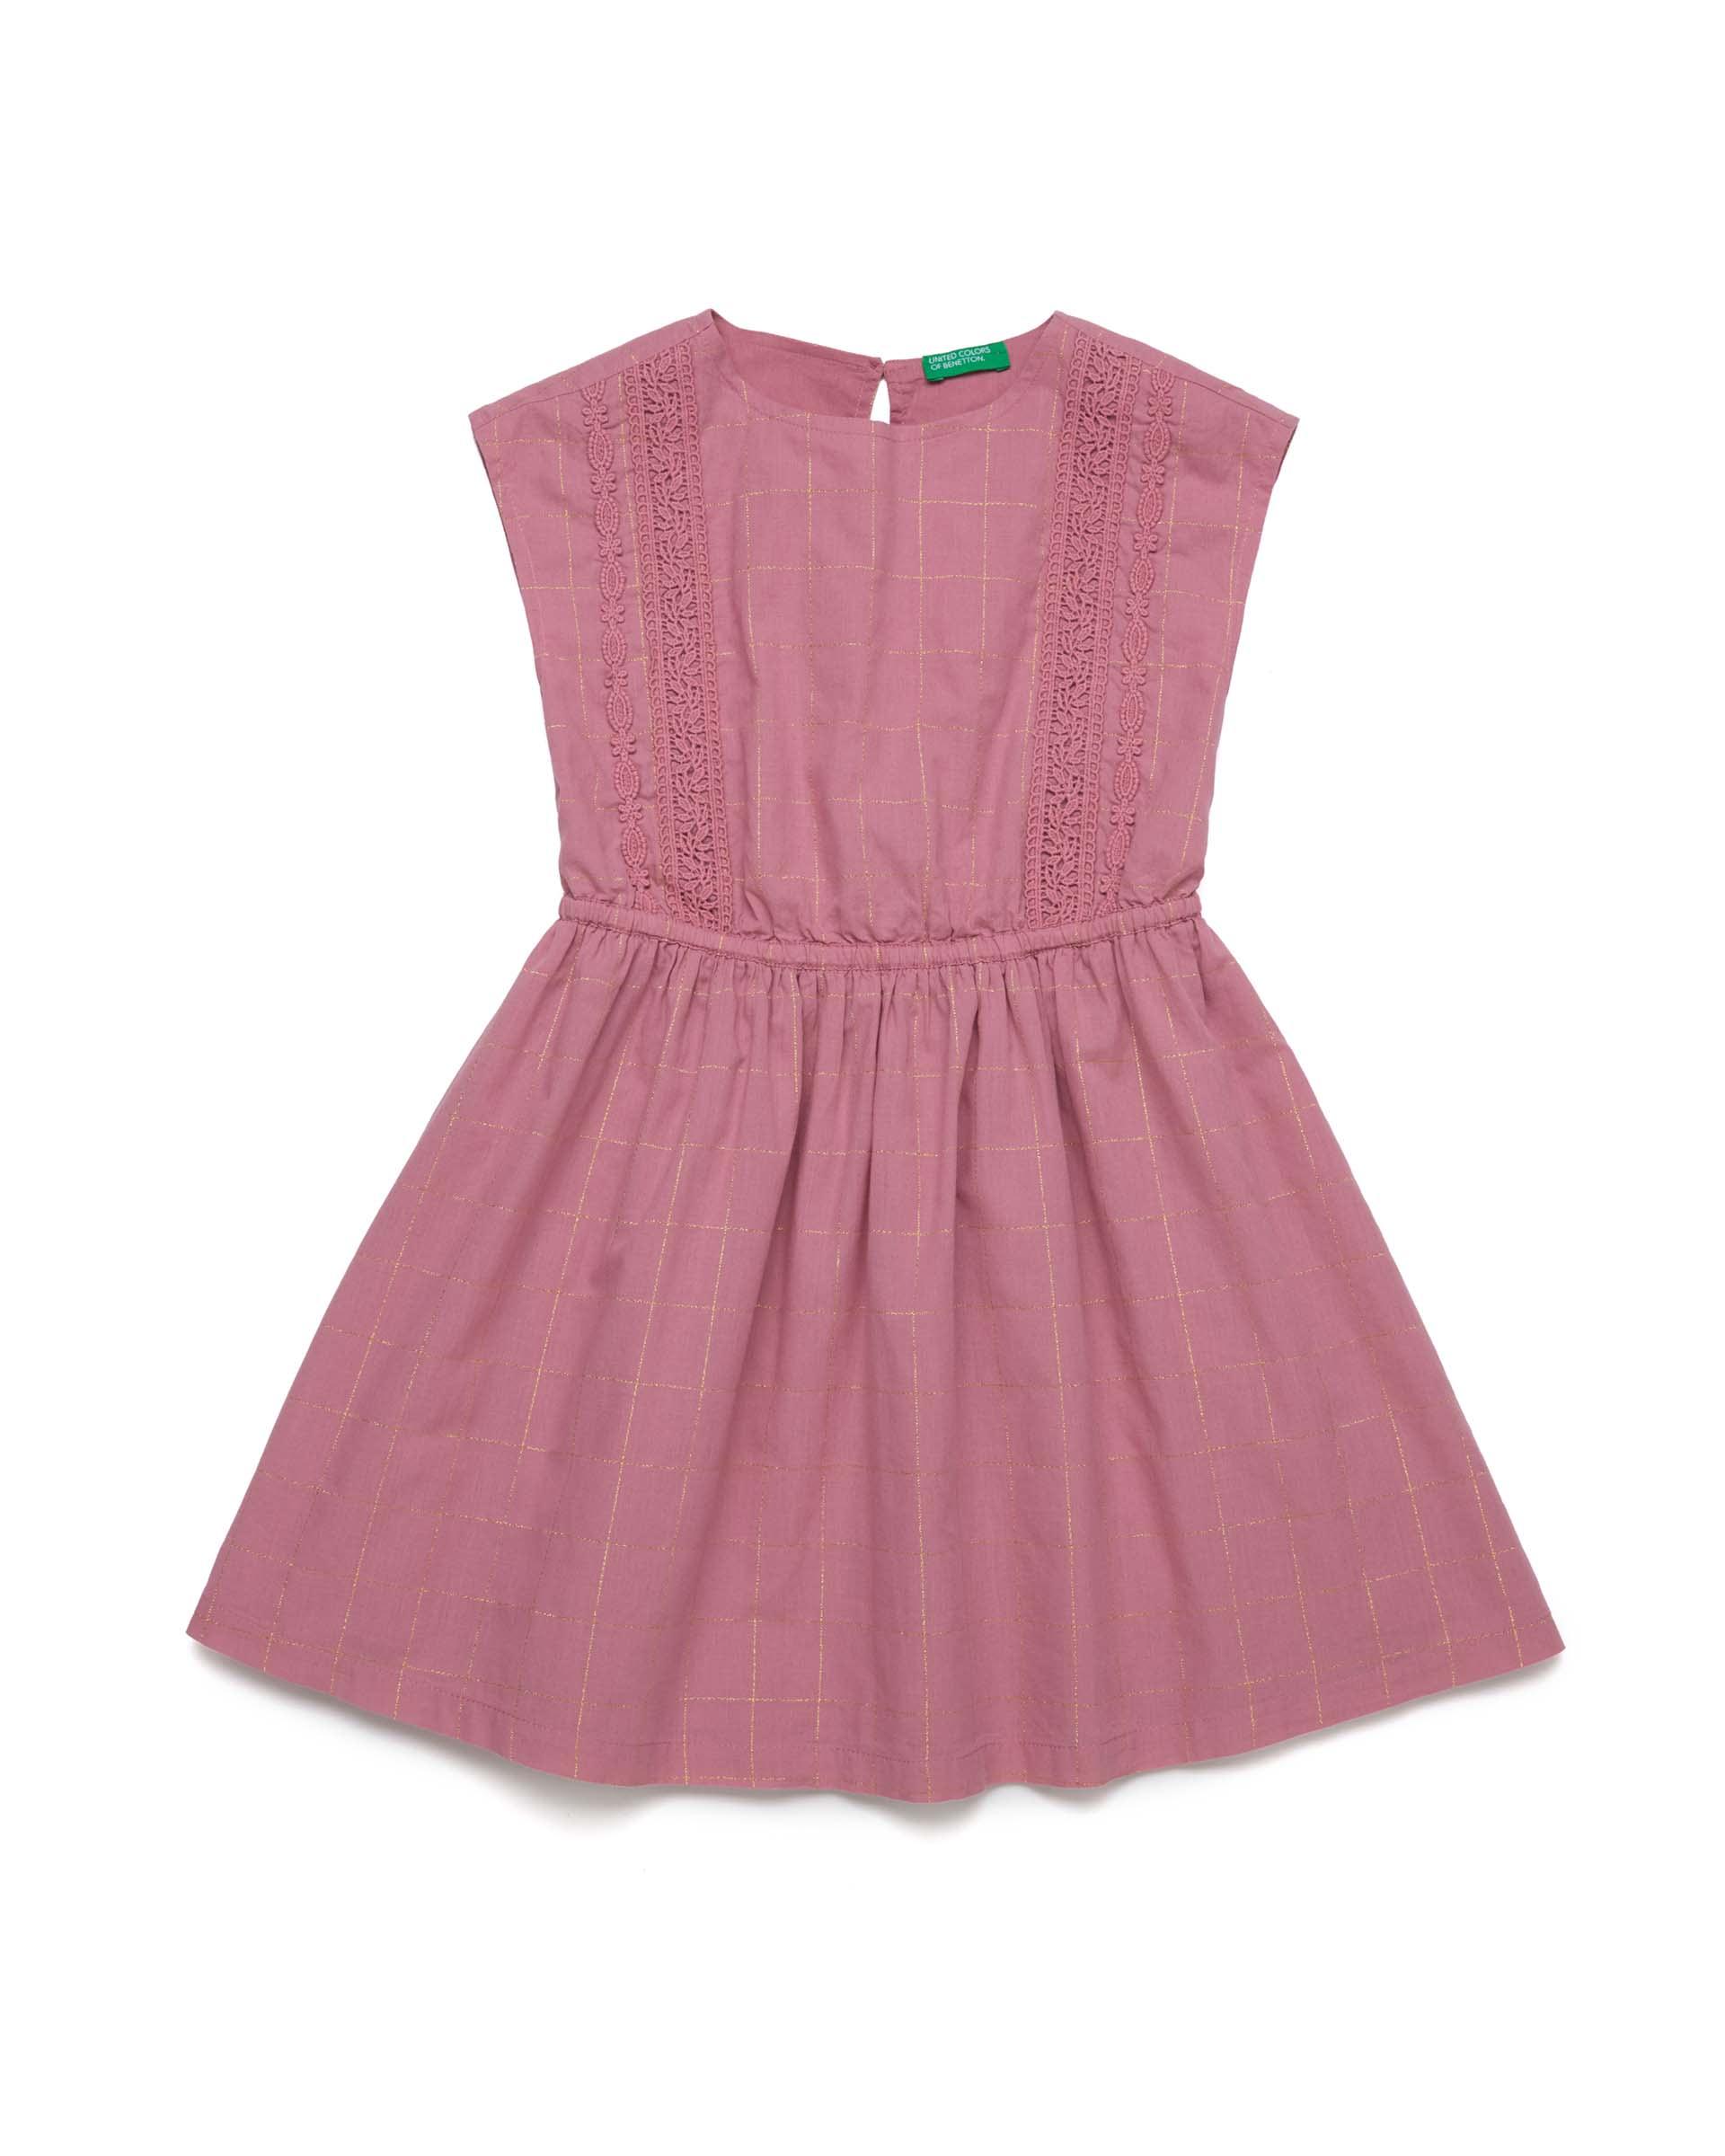 20P_4OV55VDH0_910, Платье для девочек Benetton 4OV55VDH0_910 р-р 122, United Colors of Benetton, Платья для девочек  - купить со скидкой